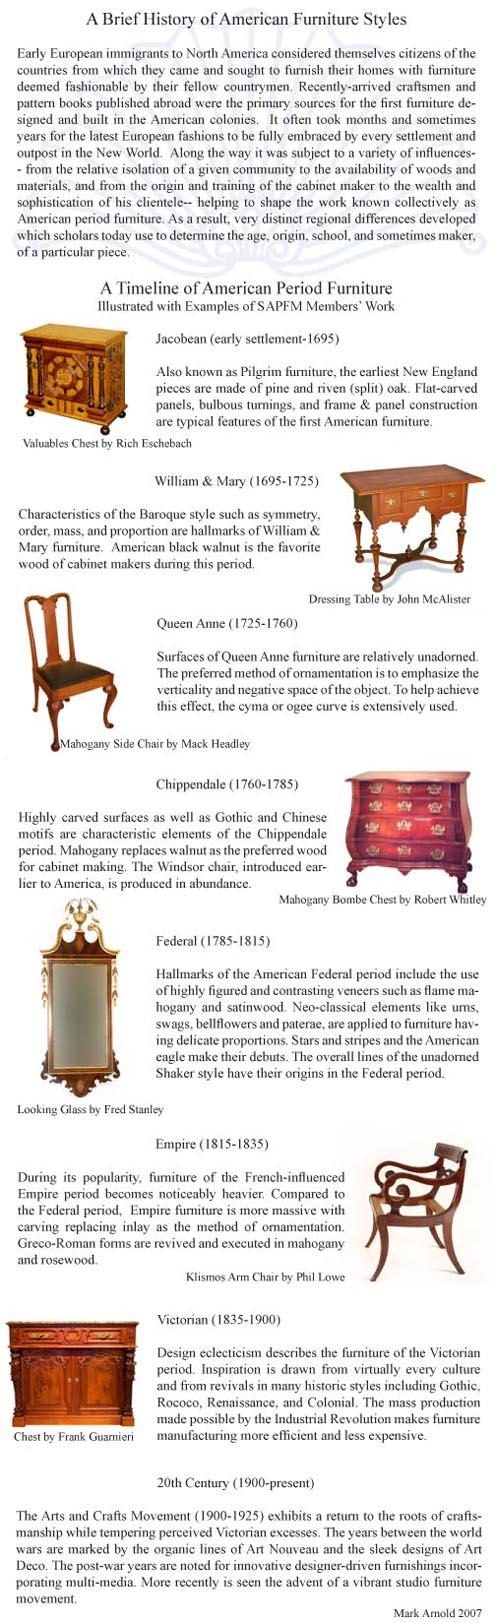 48++ Furniture styles timeline information